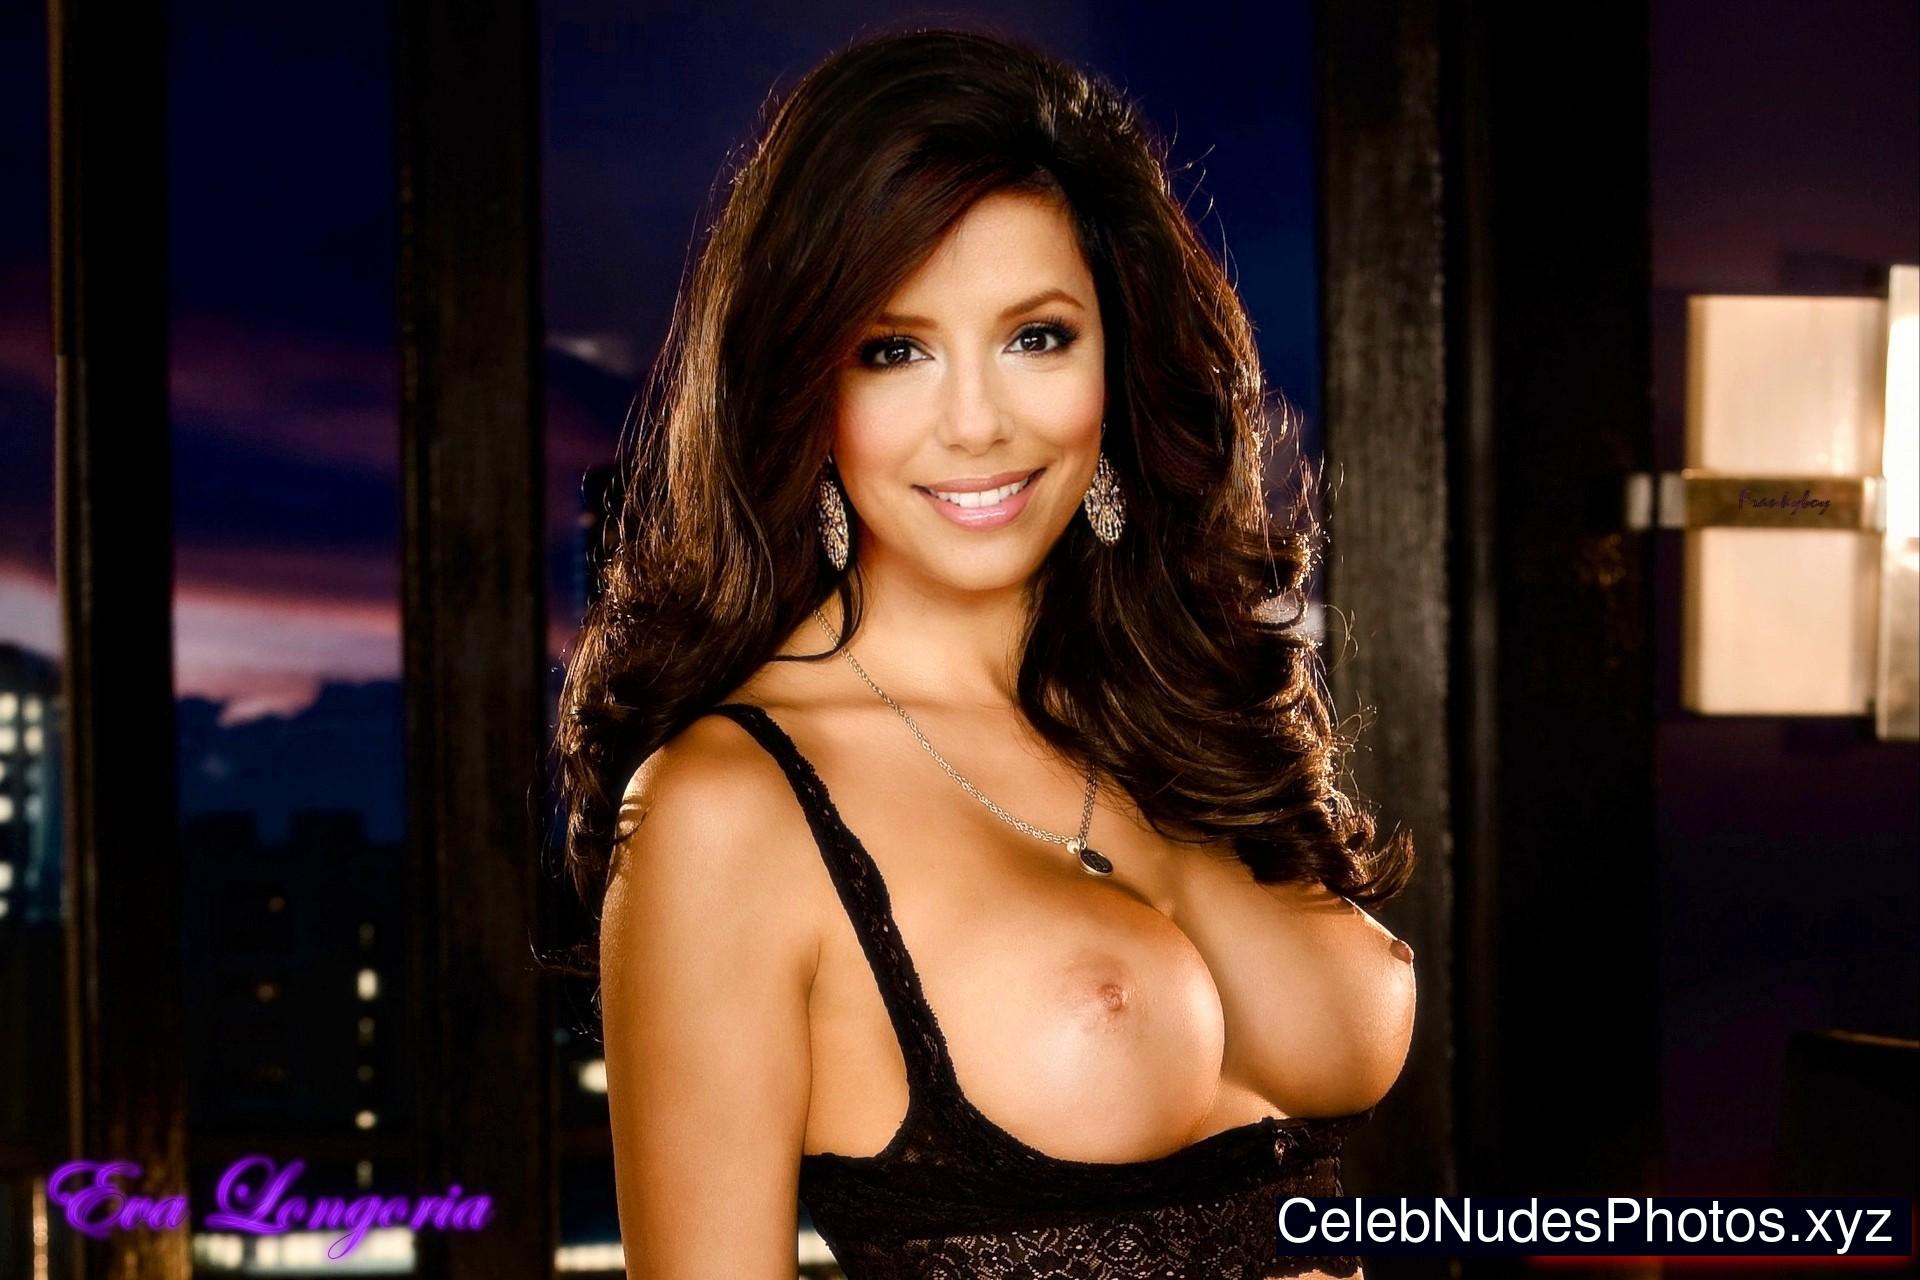 Eva Longoria Celebrity Nude Pic sexy 8